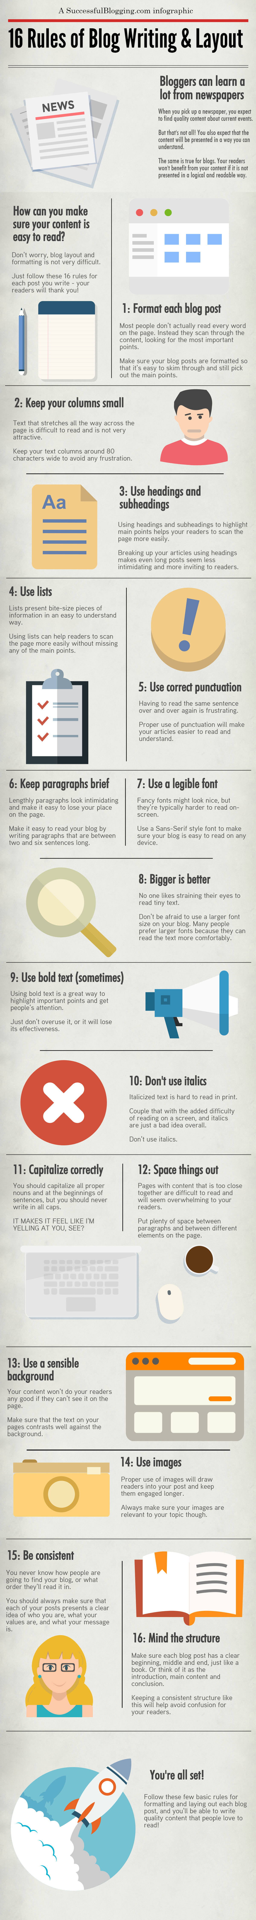 blog writing formatting tips